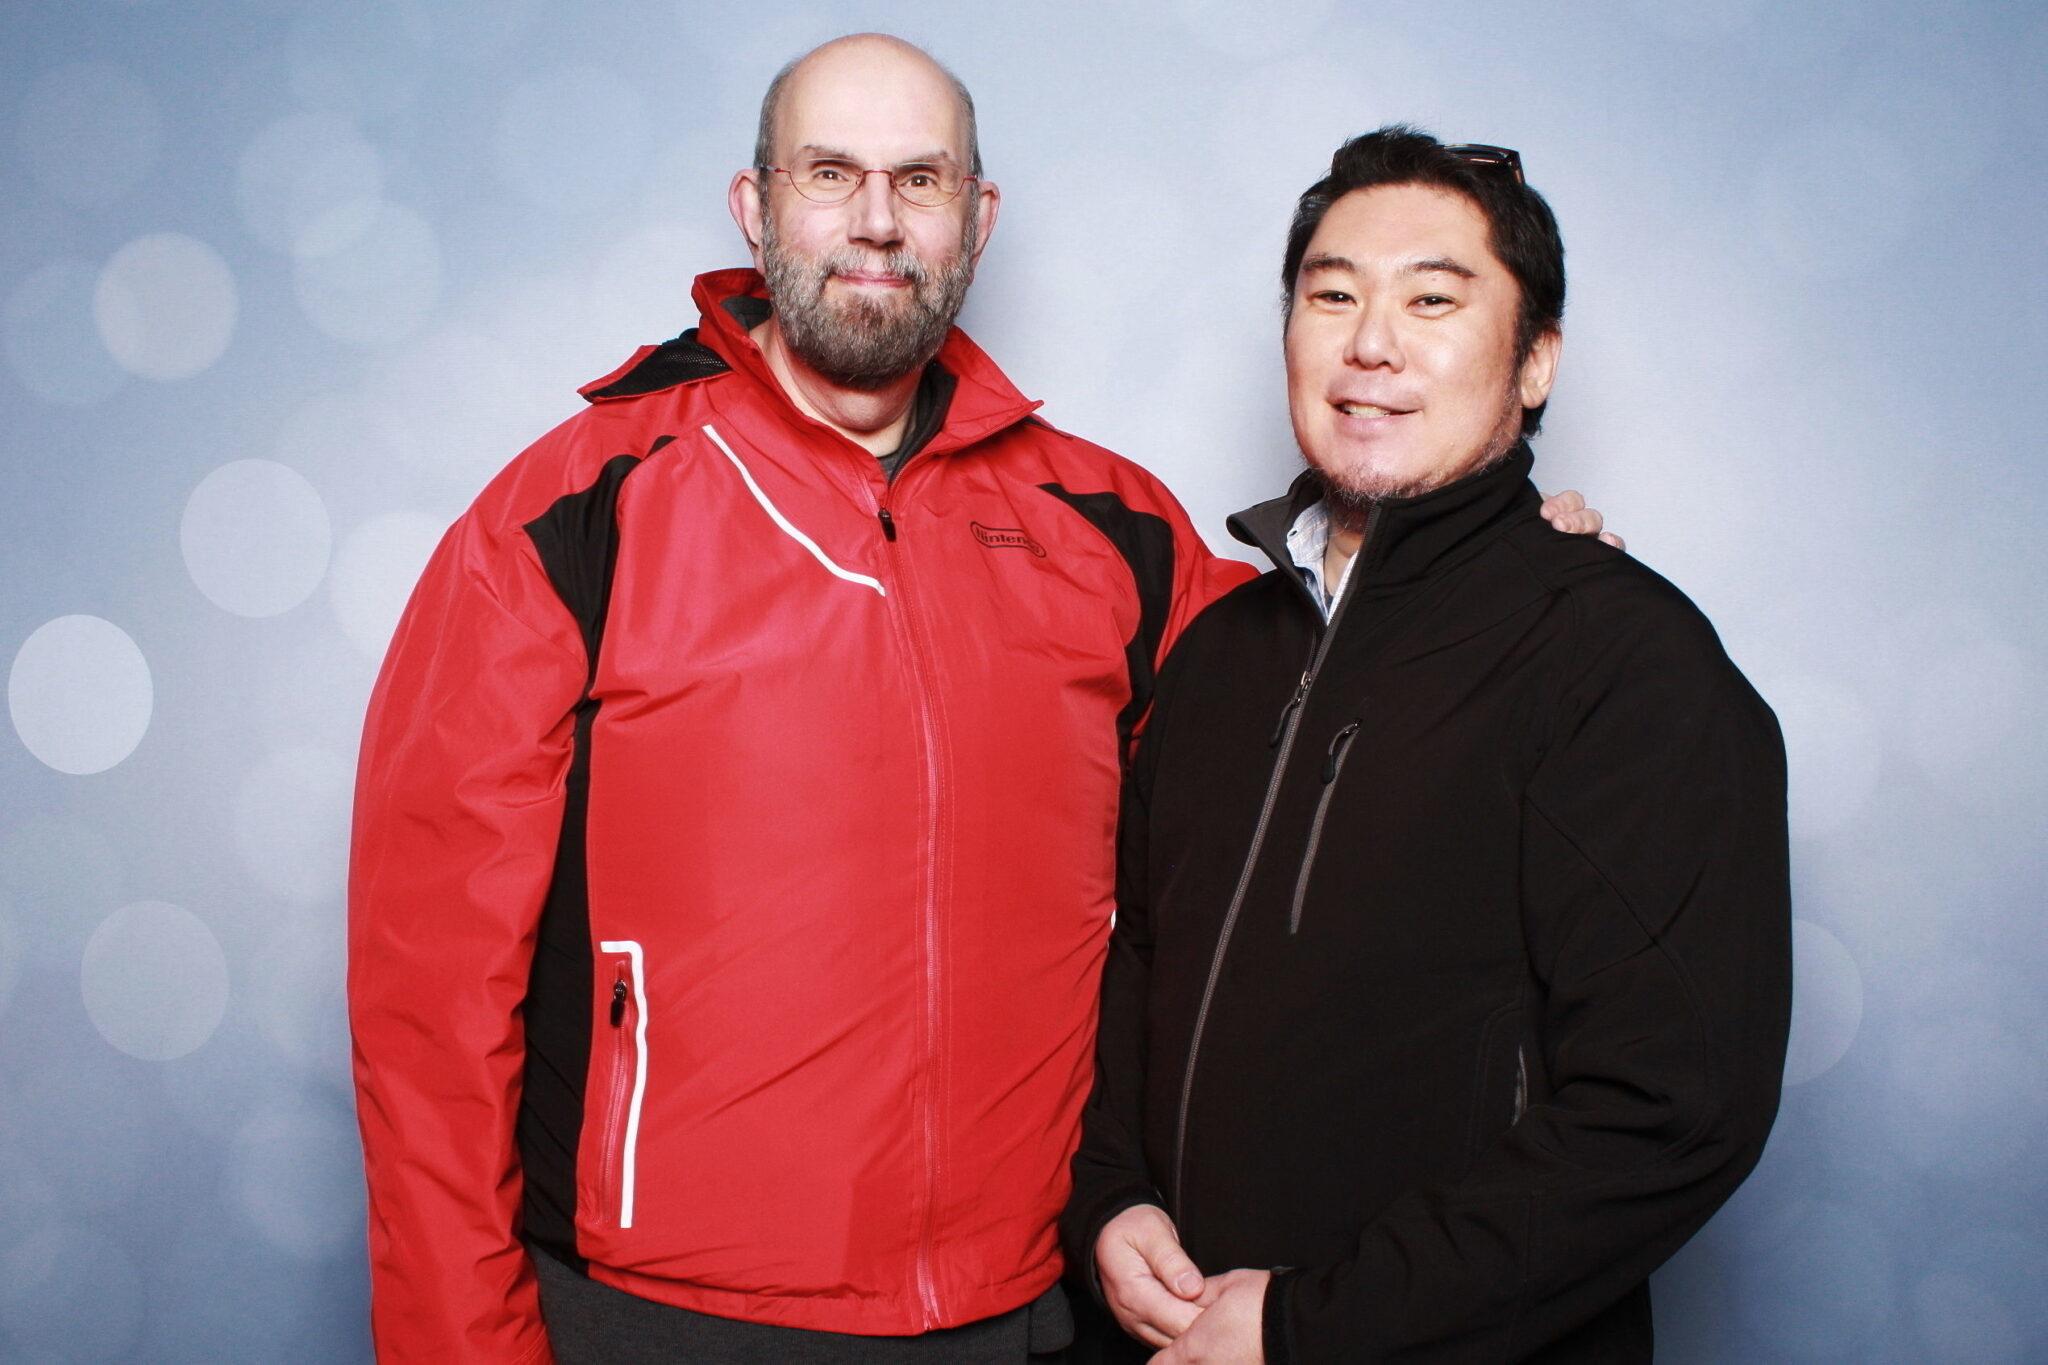 JETwit.com - JQ Magazine: Nippon in New York — Joe Hisaishi, Anime NYC, Shoplifters